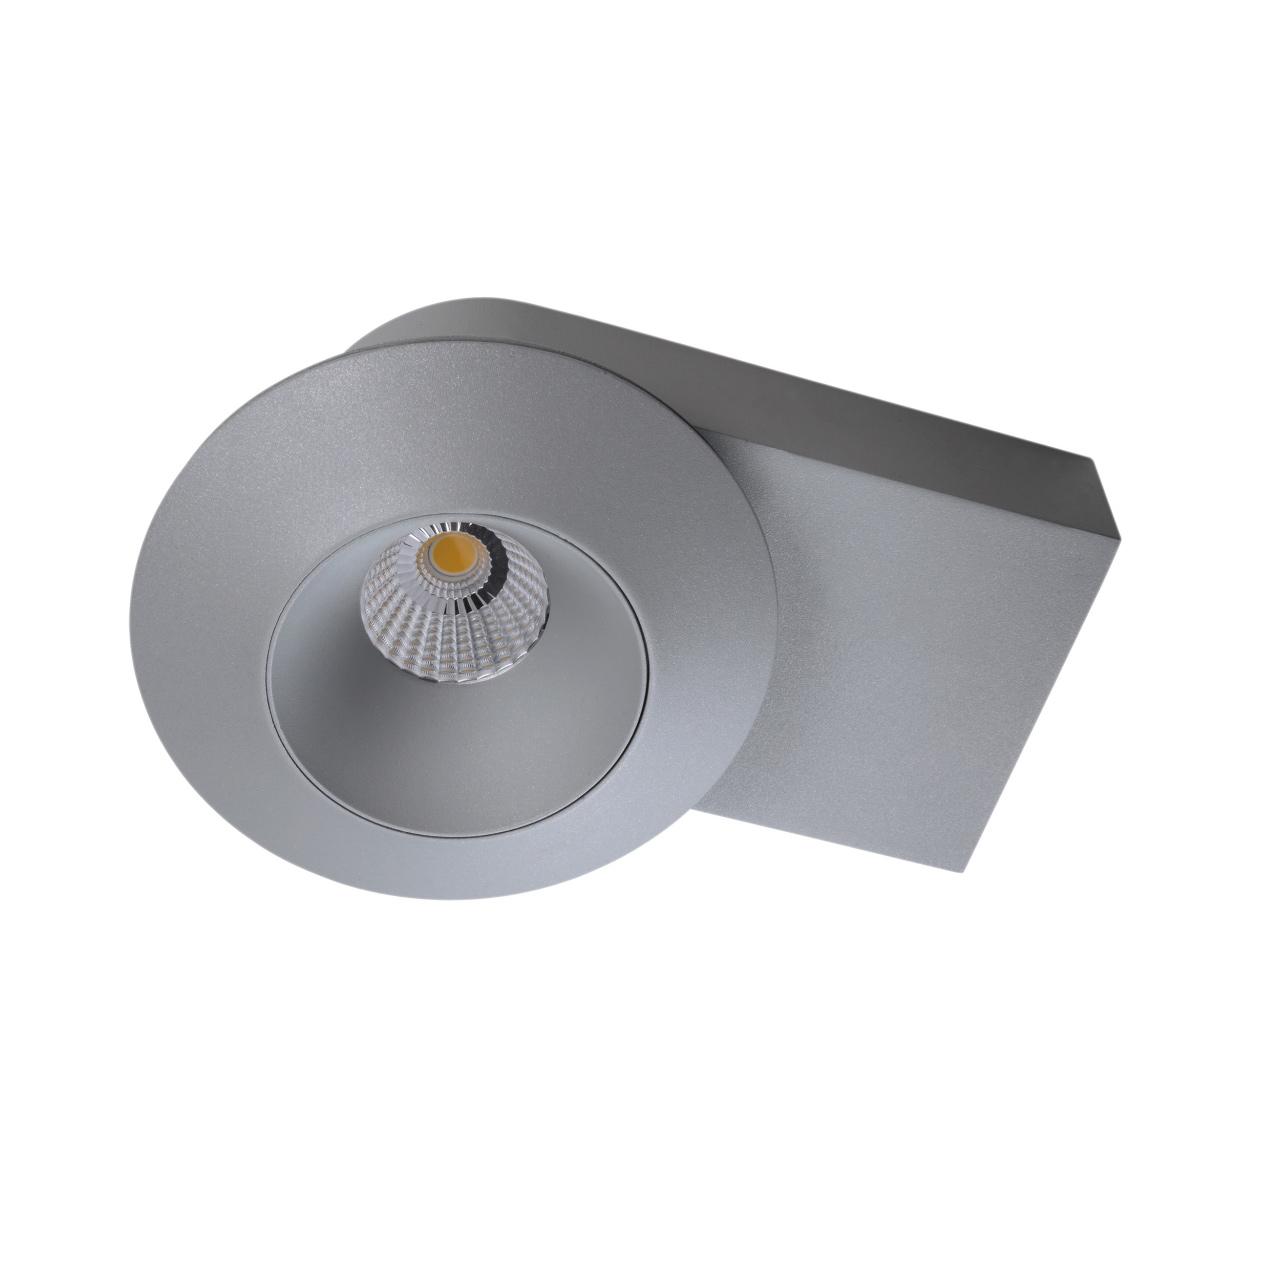 Светильник Orbe LED 15W 1240LM 60G серый 4000K Lightstar 051219